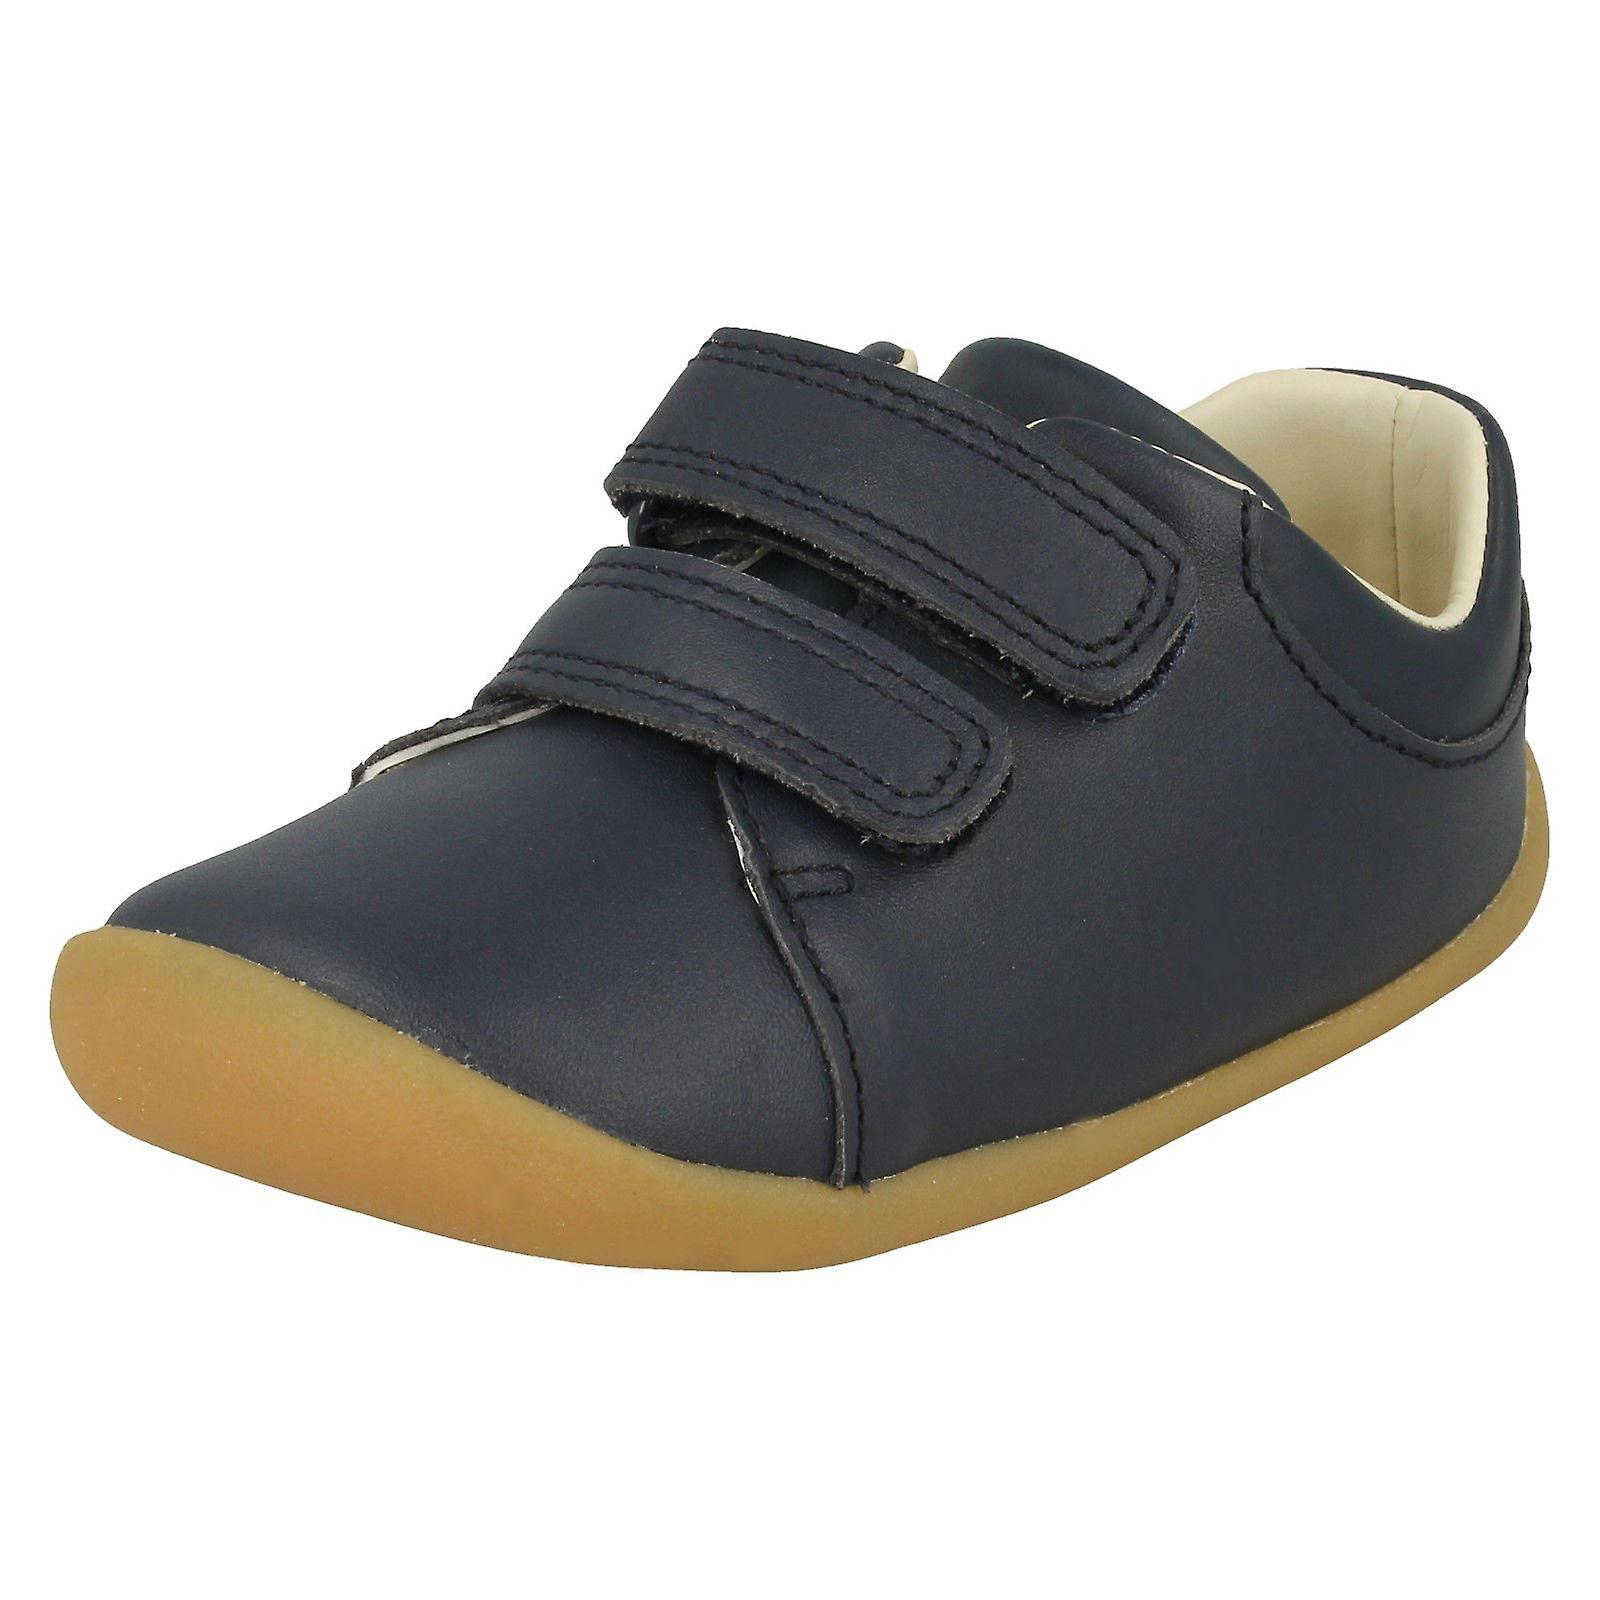 Skechers GO Walk Move Quarter Strap Sandals Brilliancy Black A